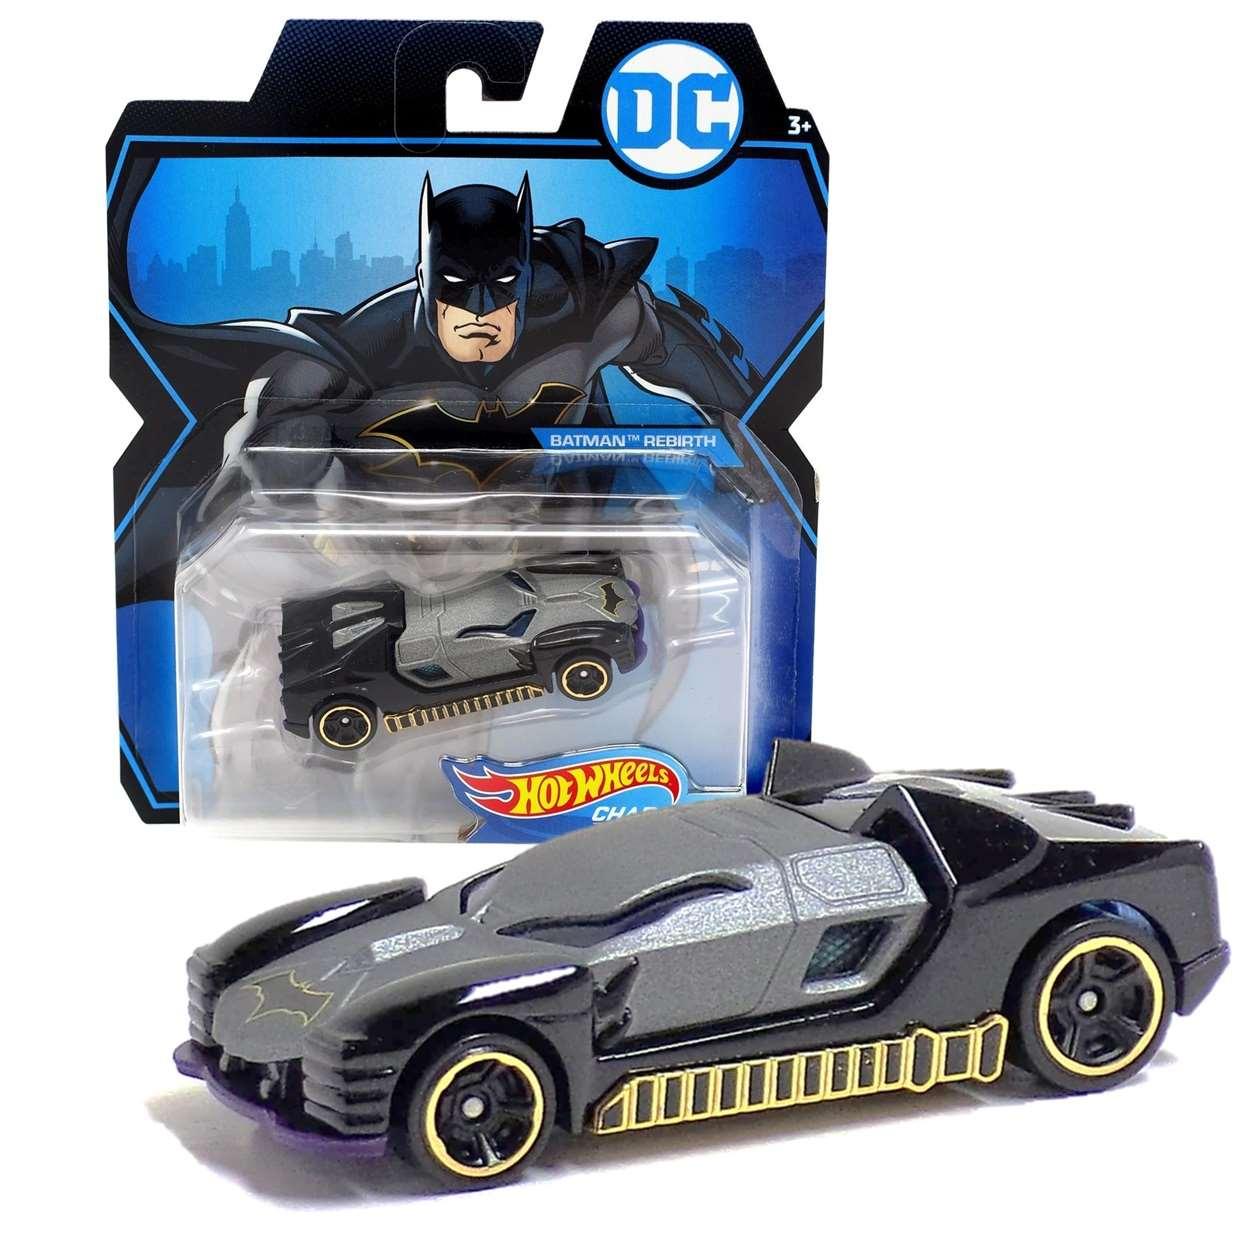 Batman Rebirth Gmh94 Hot Wheels Character Cars Die Cast